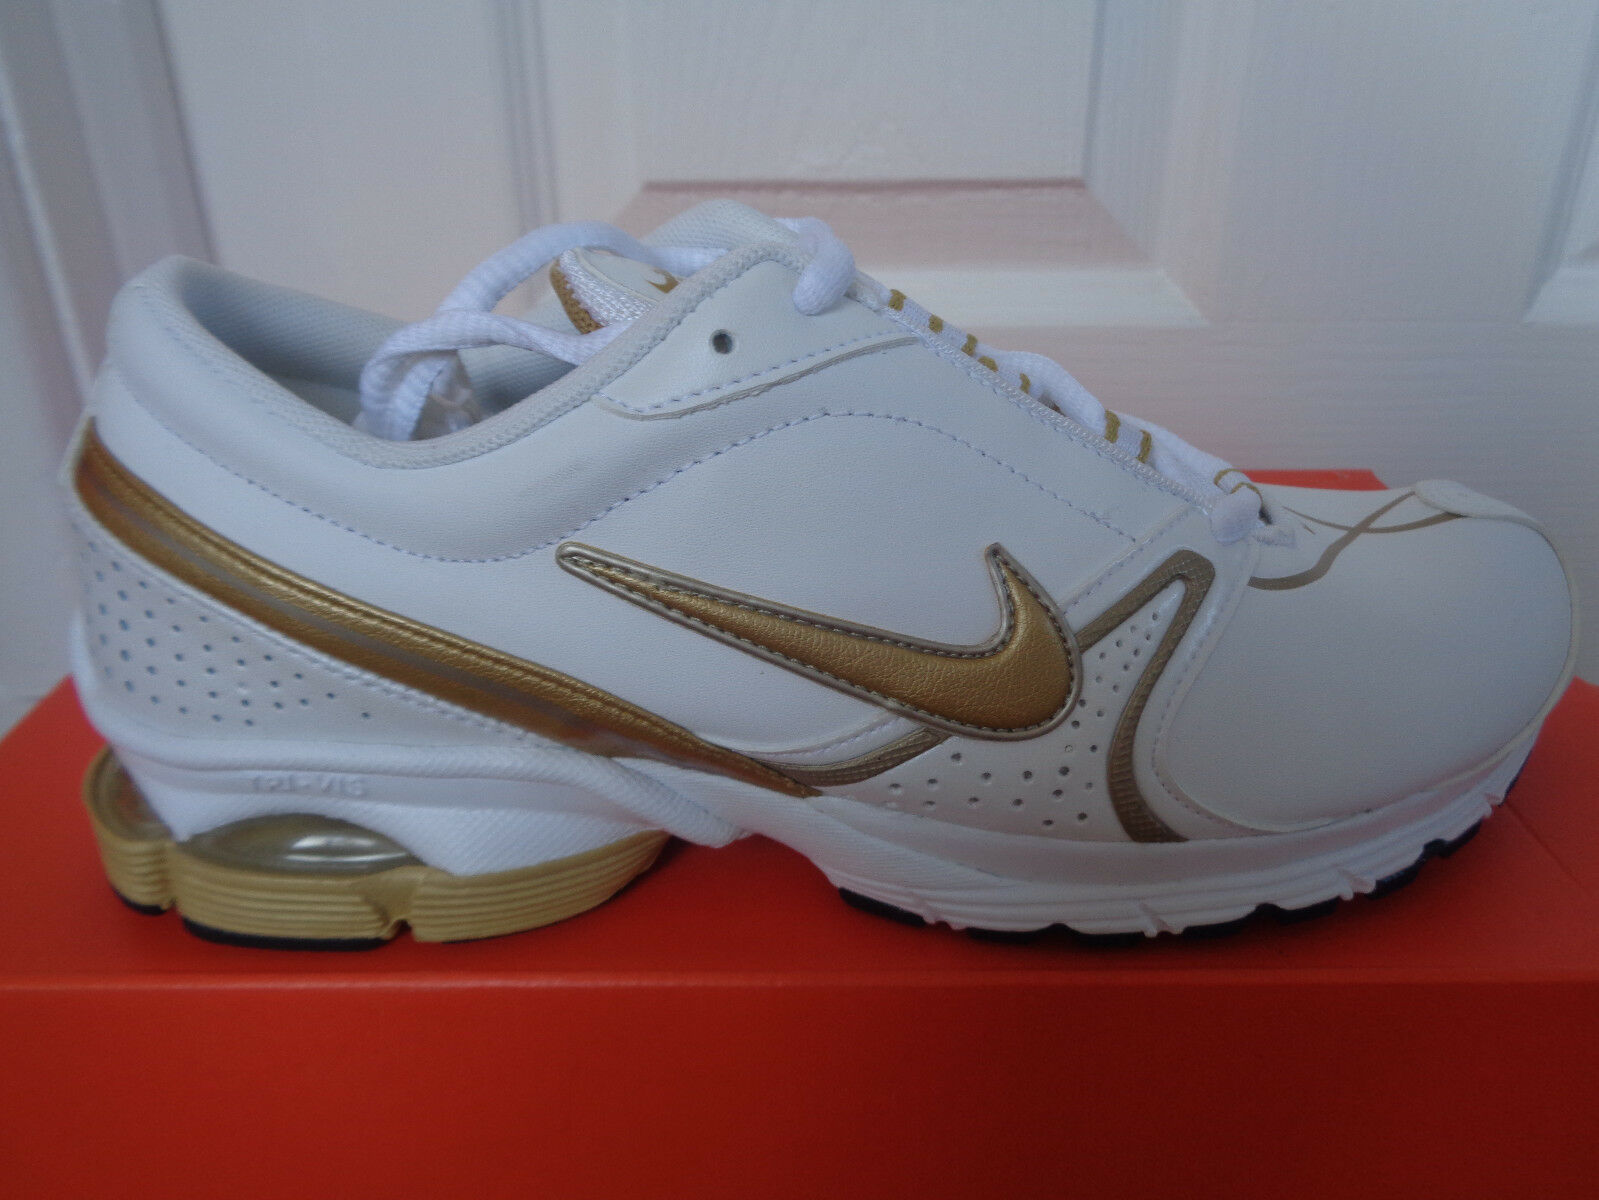 Nike Air Vapor III Cuir Wmns Baskets 318251 171 UK 5 EU 38.5 US 7.5 Neuf + Boîte